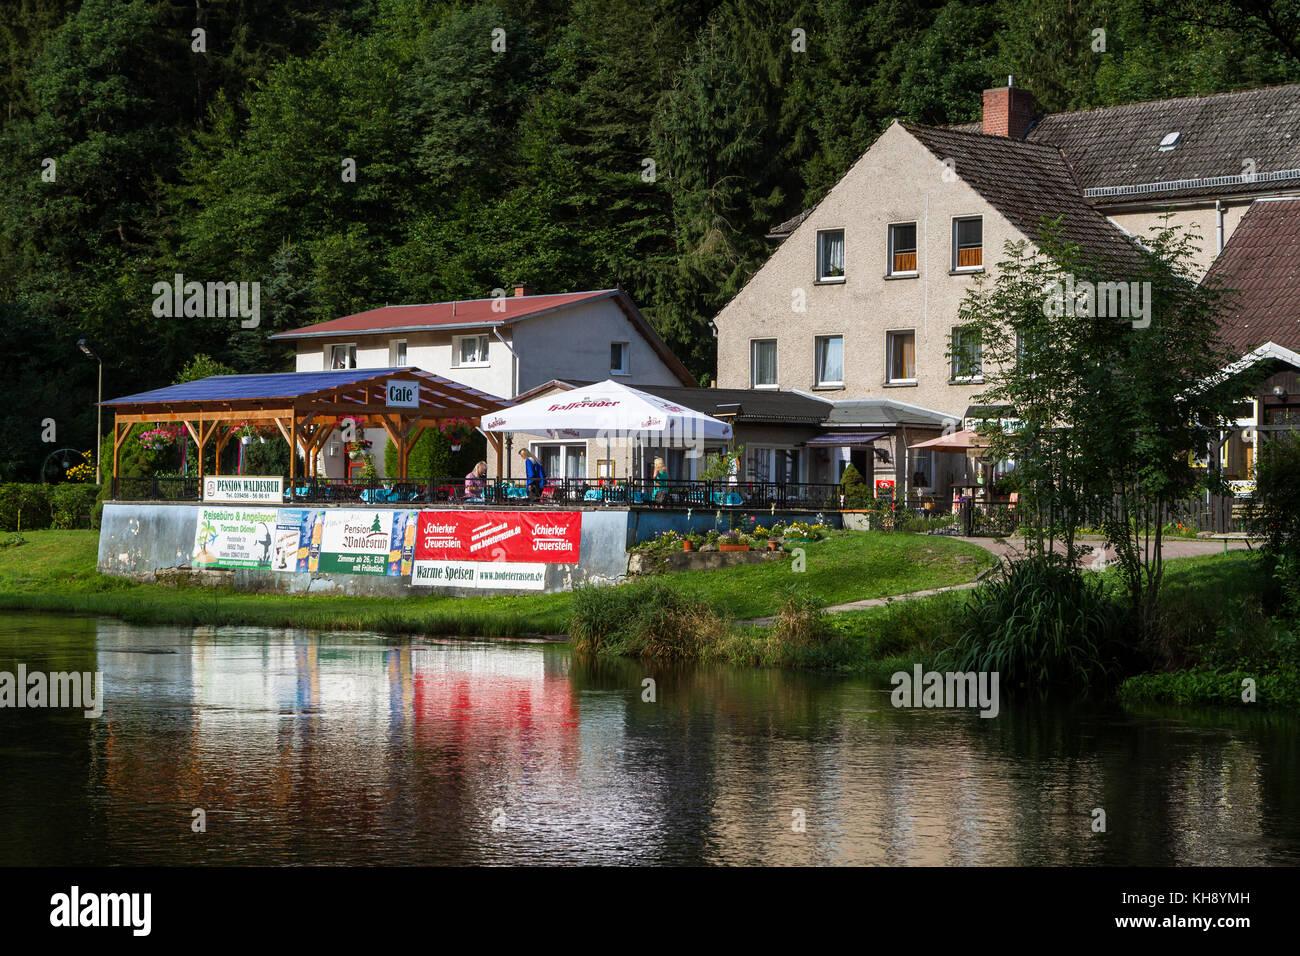 Treseburg Bodetal Foto de stock